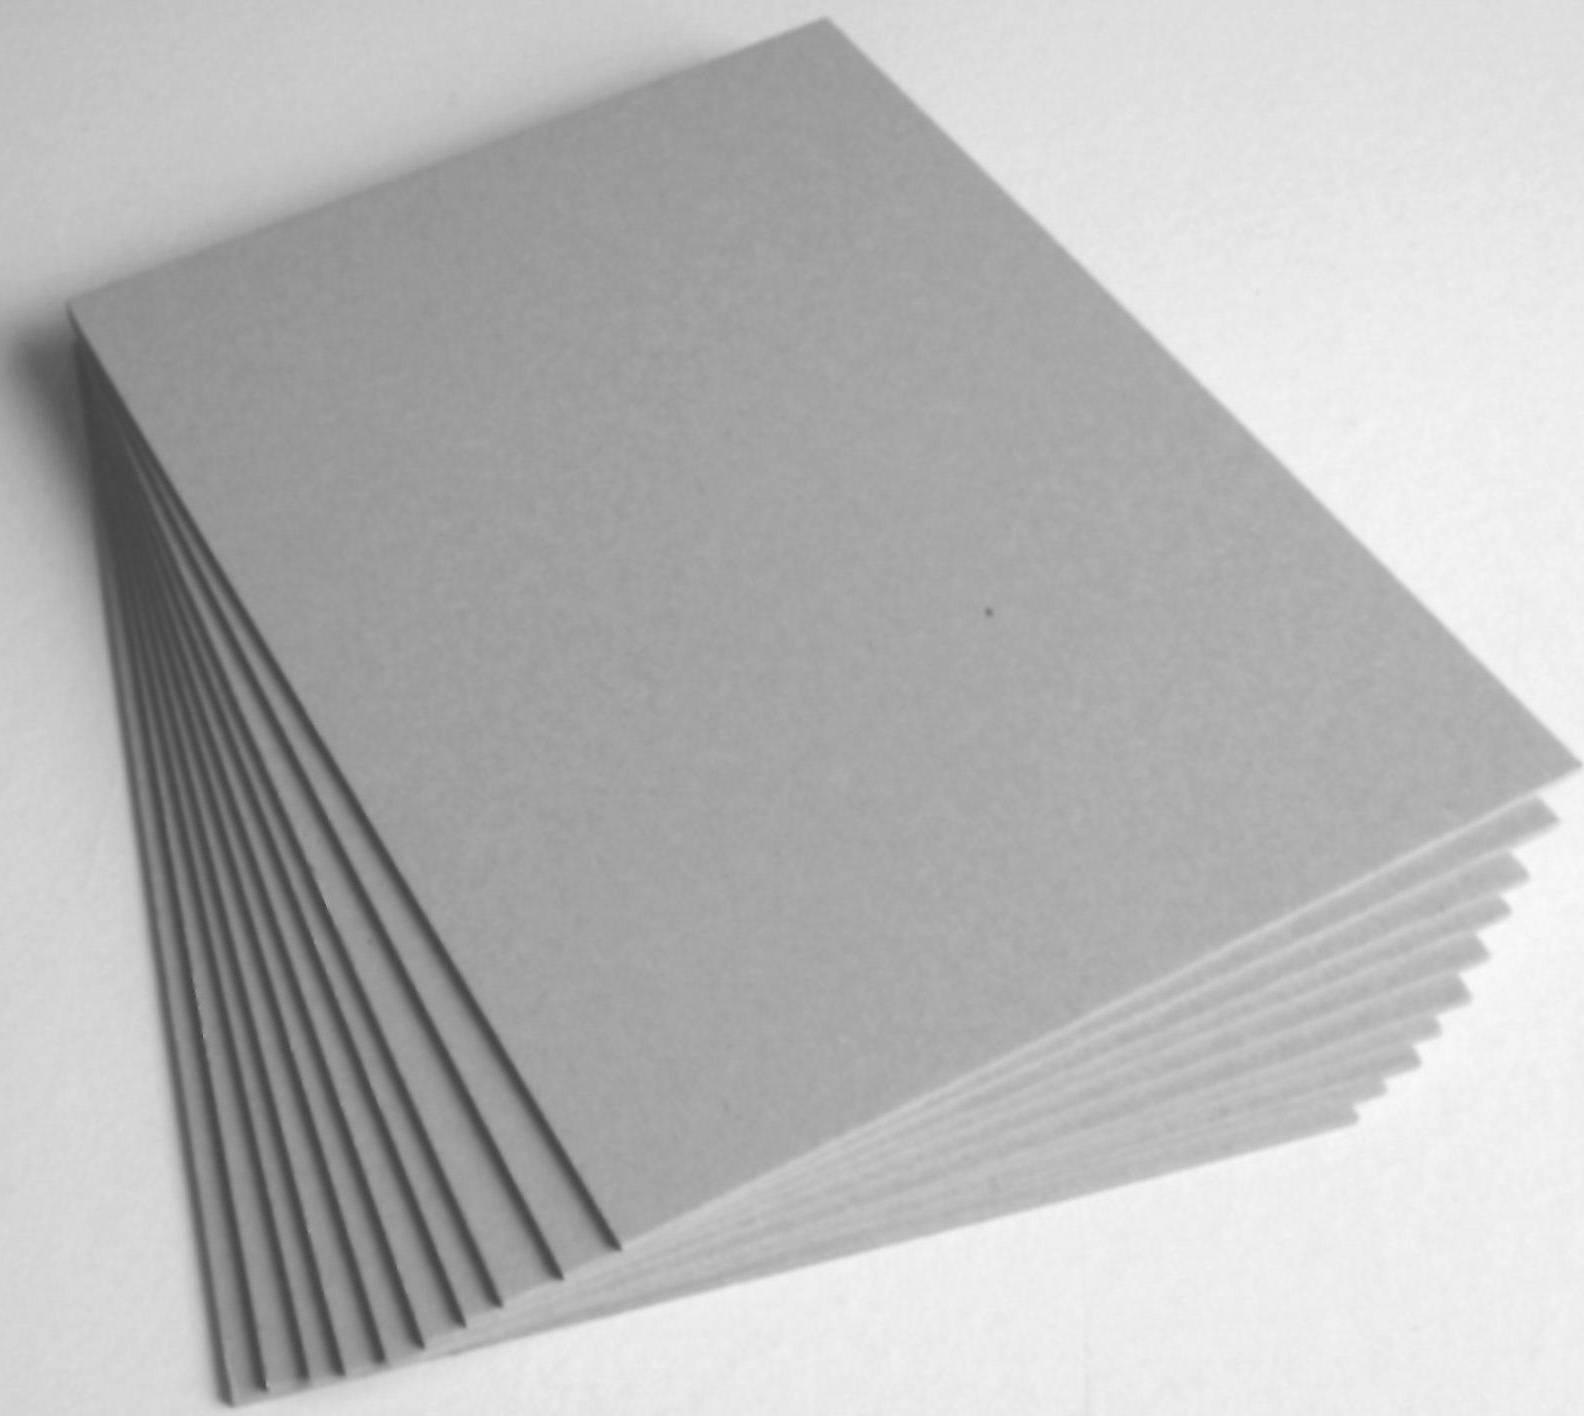 sinzoopaper hot selling waste paper pulp laminated gray cardboard sheet